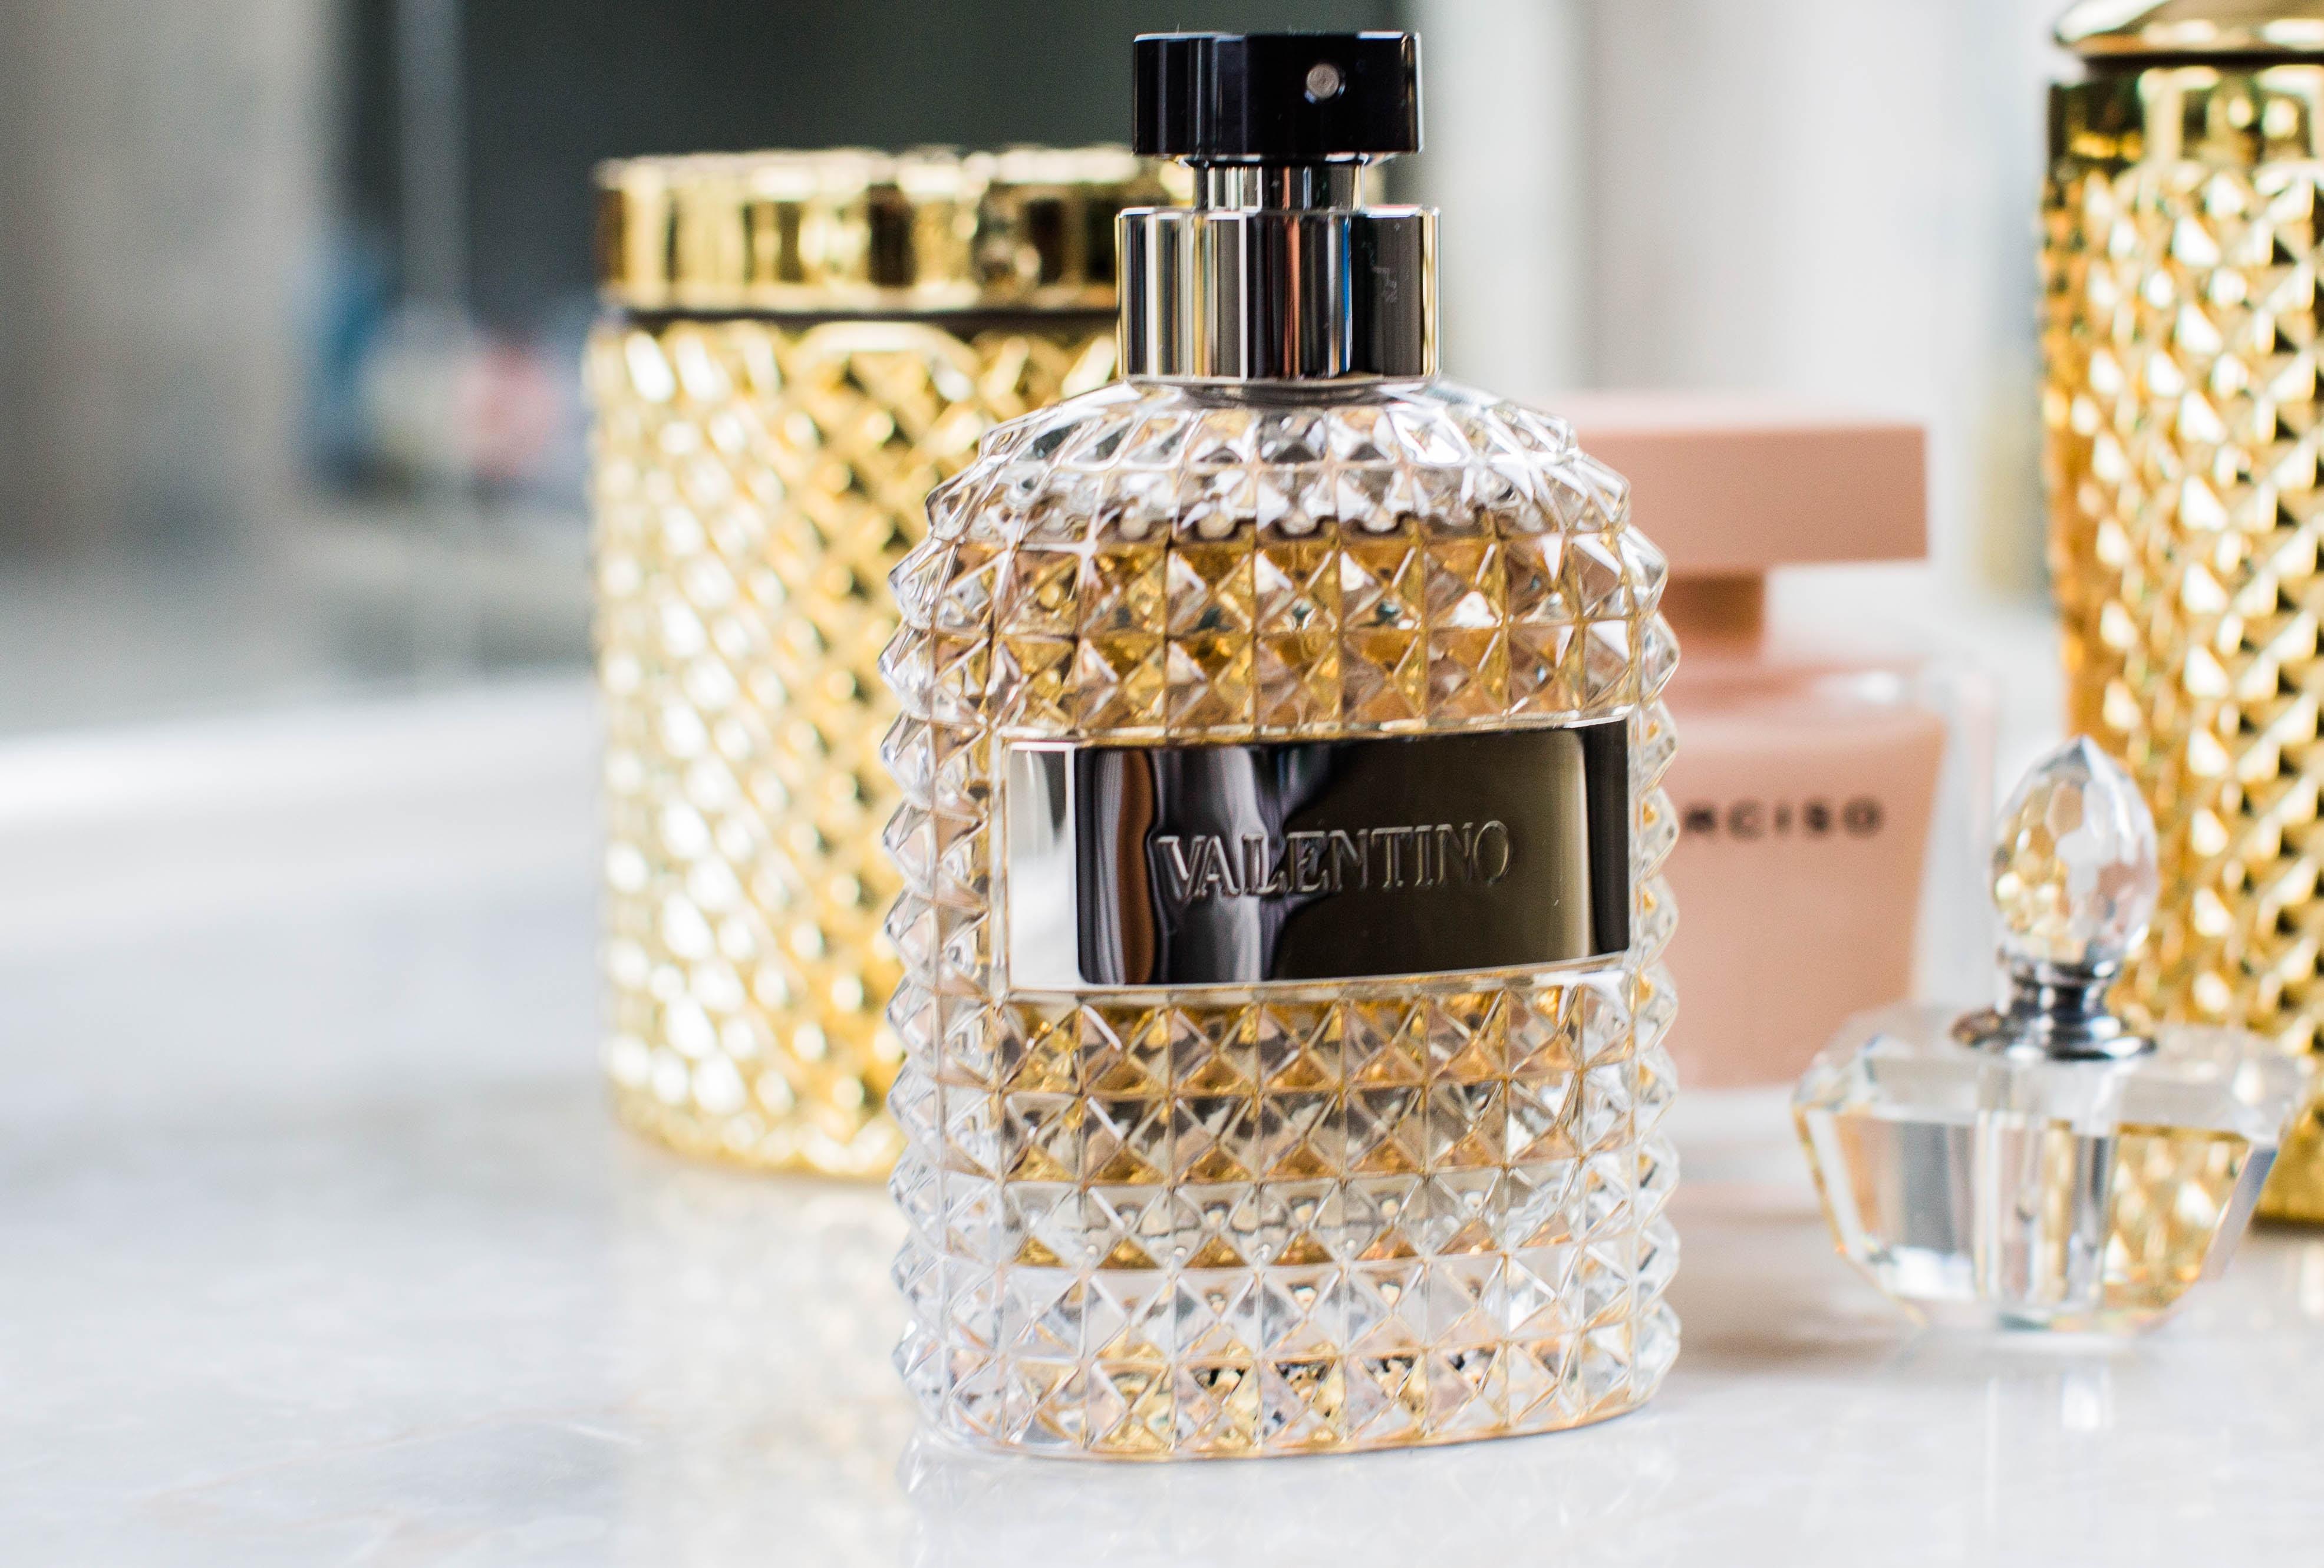 Valentino fragrance bottle